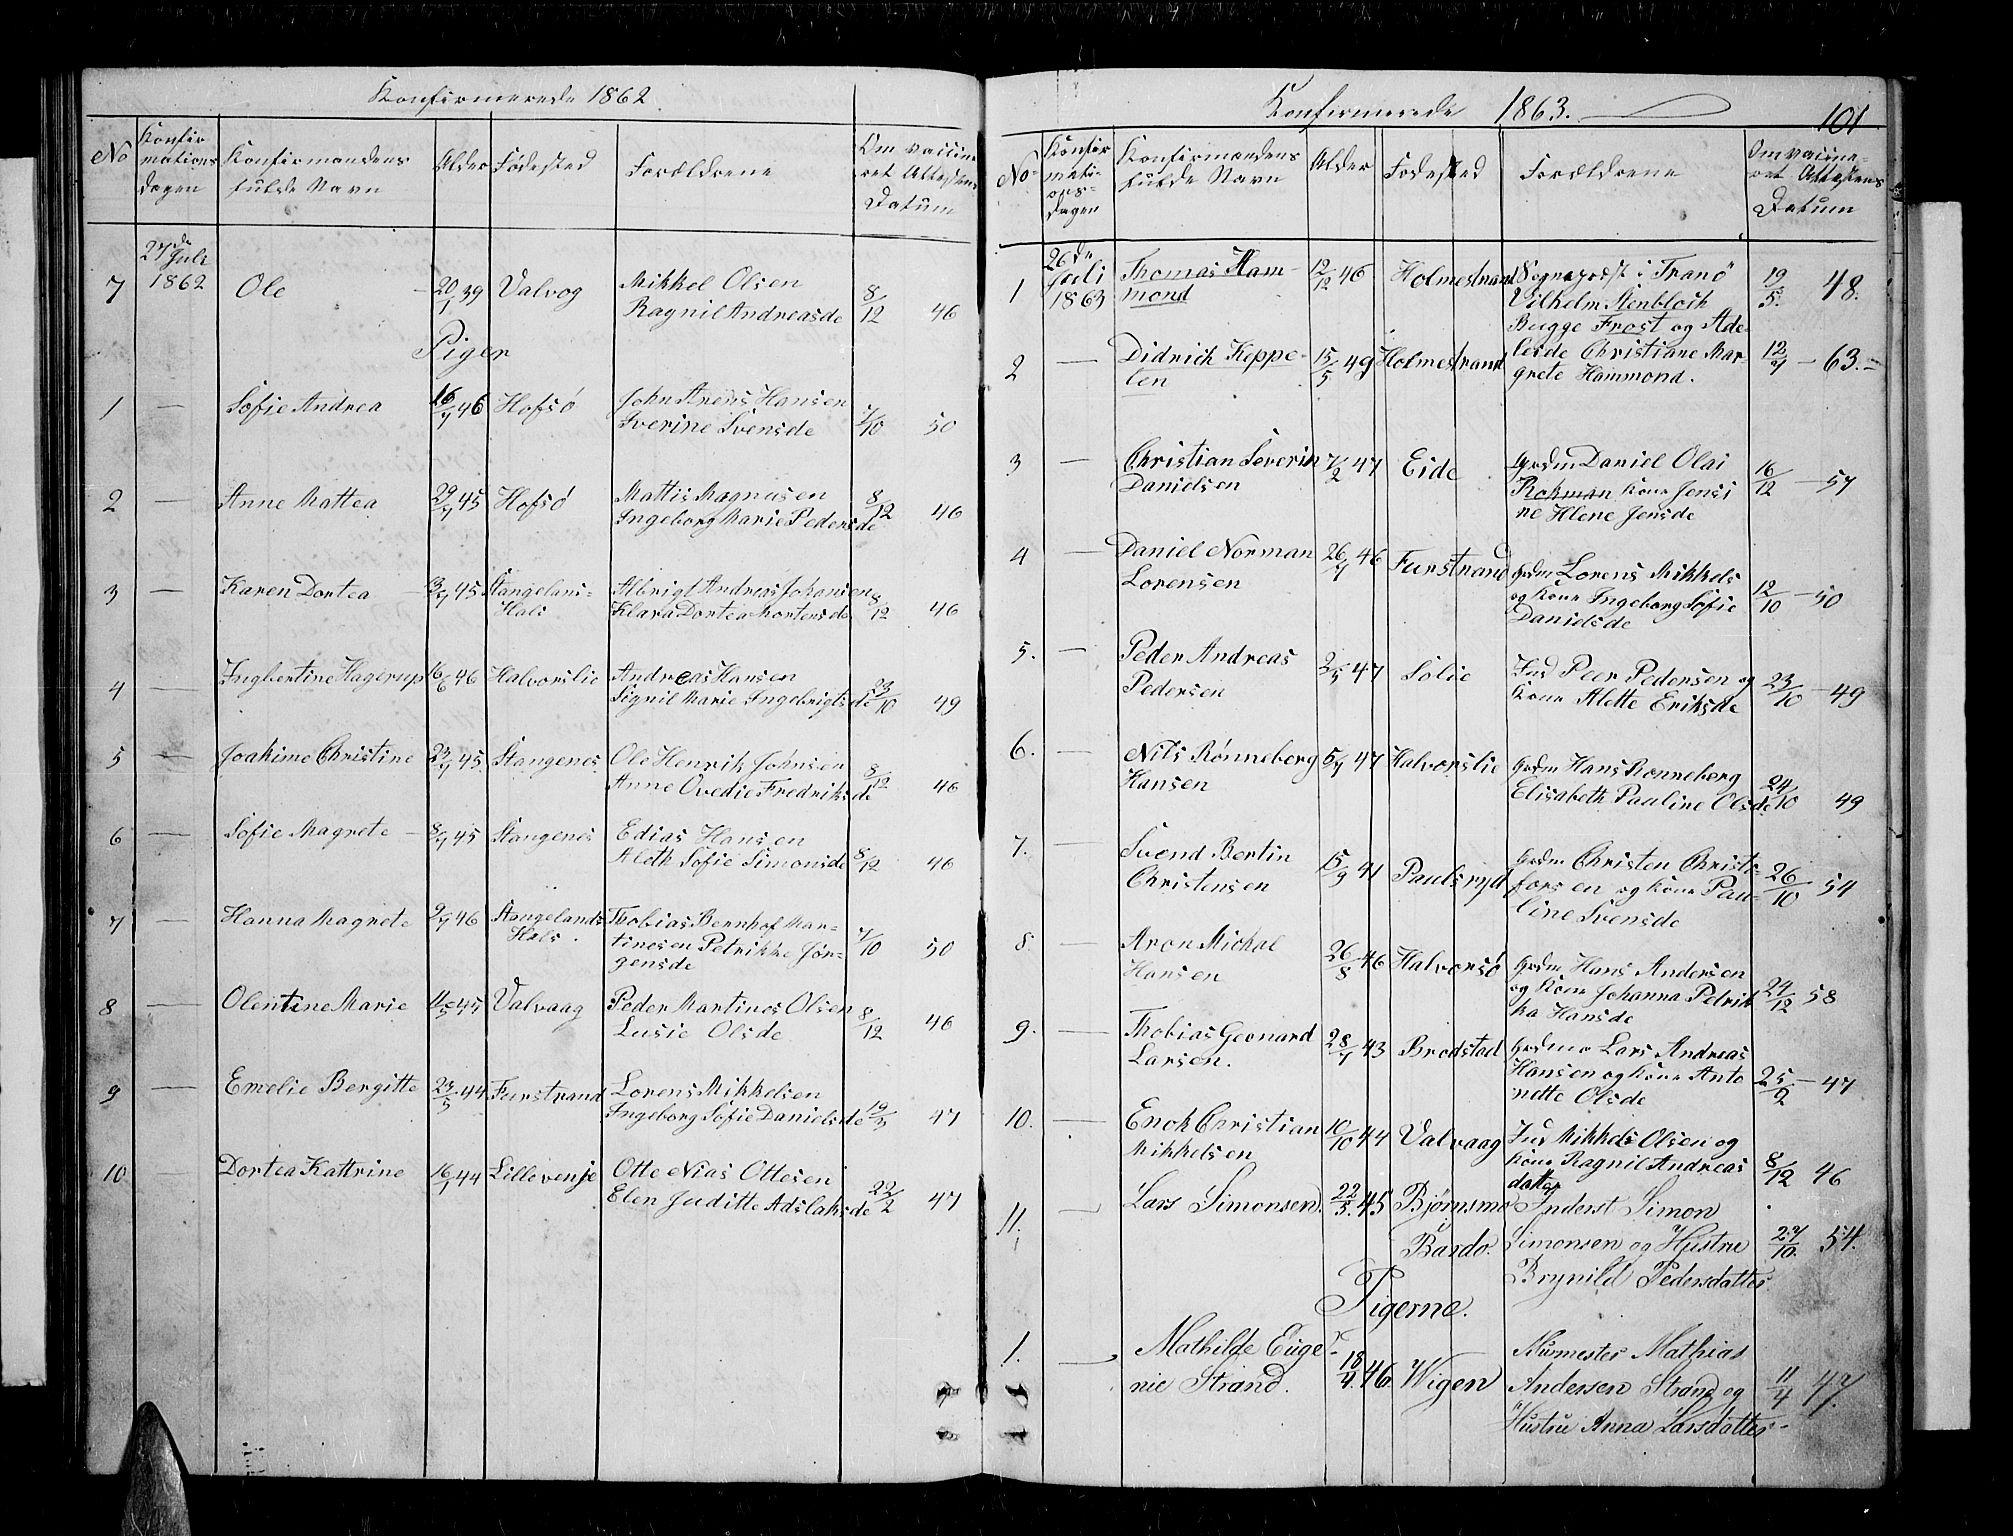 SATØ, Tranøy sokneprestkontor, I/Ia/Iab/L0003klokker: Klokkerbok nr. 3, 1861-1887, s. 101